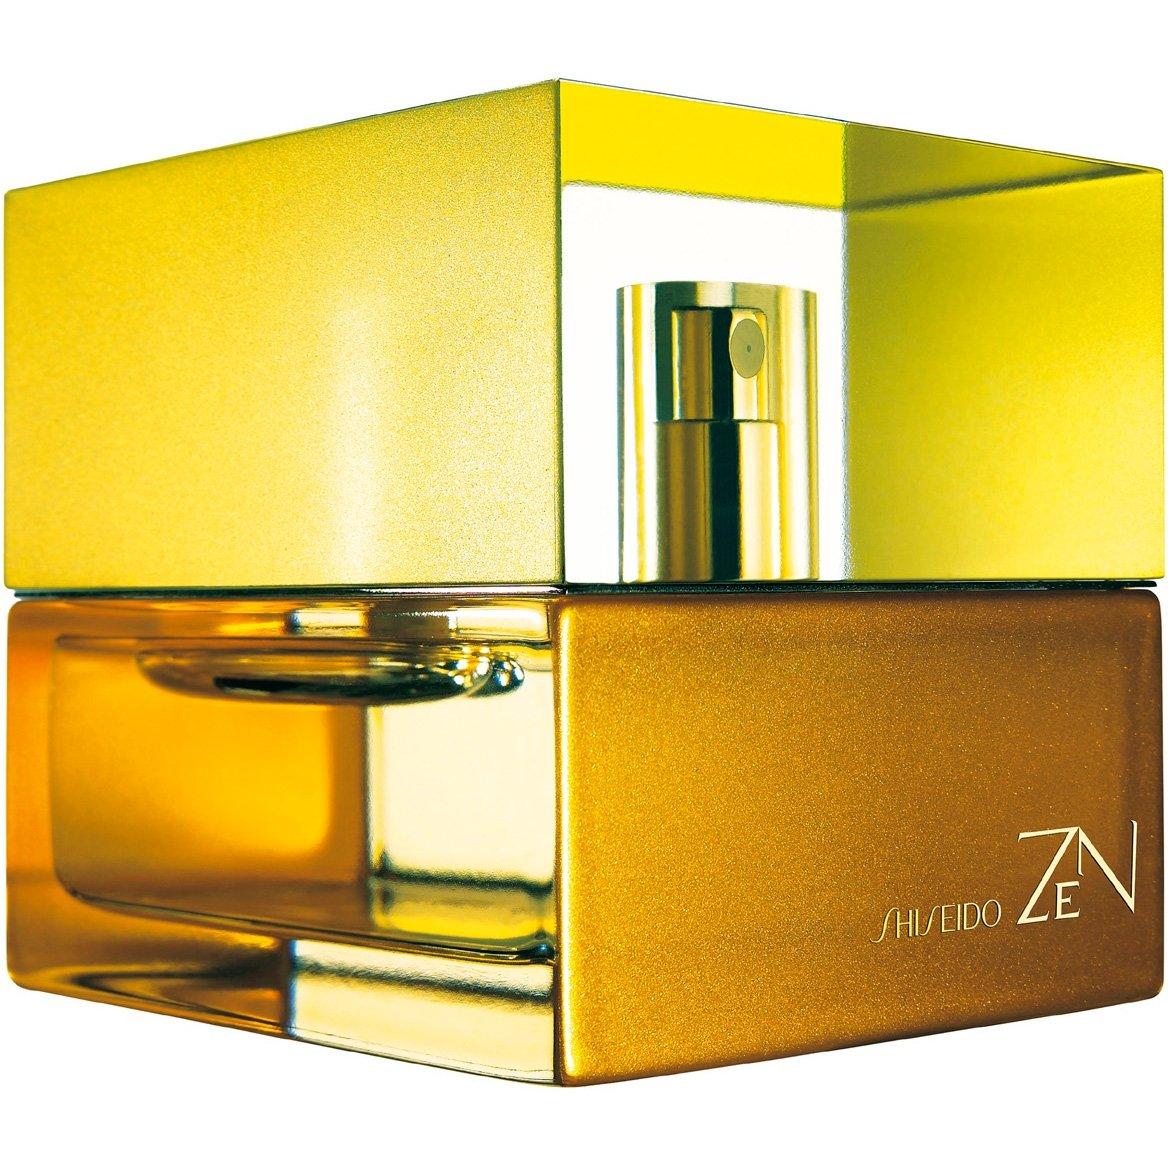 Amazon.com : Zen/Shiseido Edp Purse Spray 0.8 Oz (25 Ml) (W) : Beauty